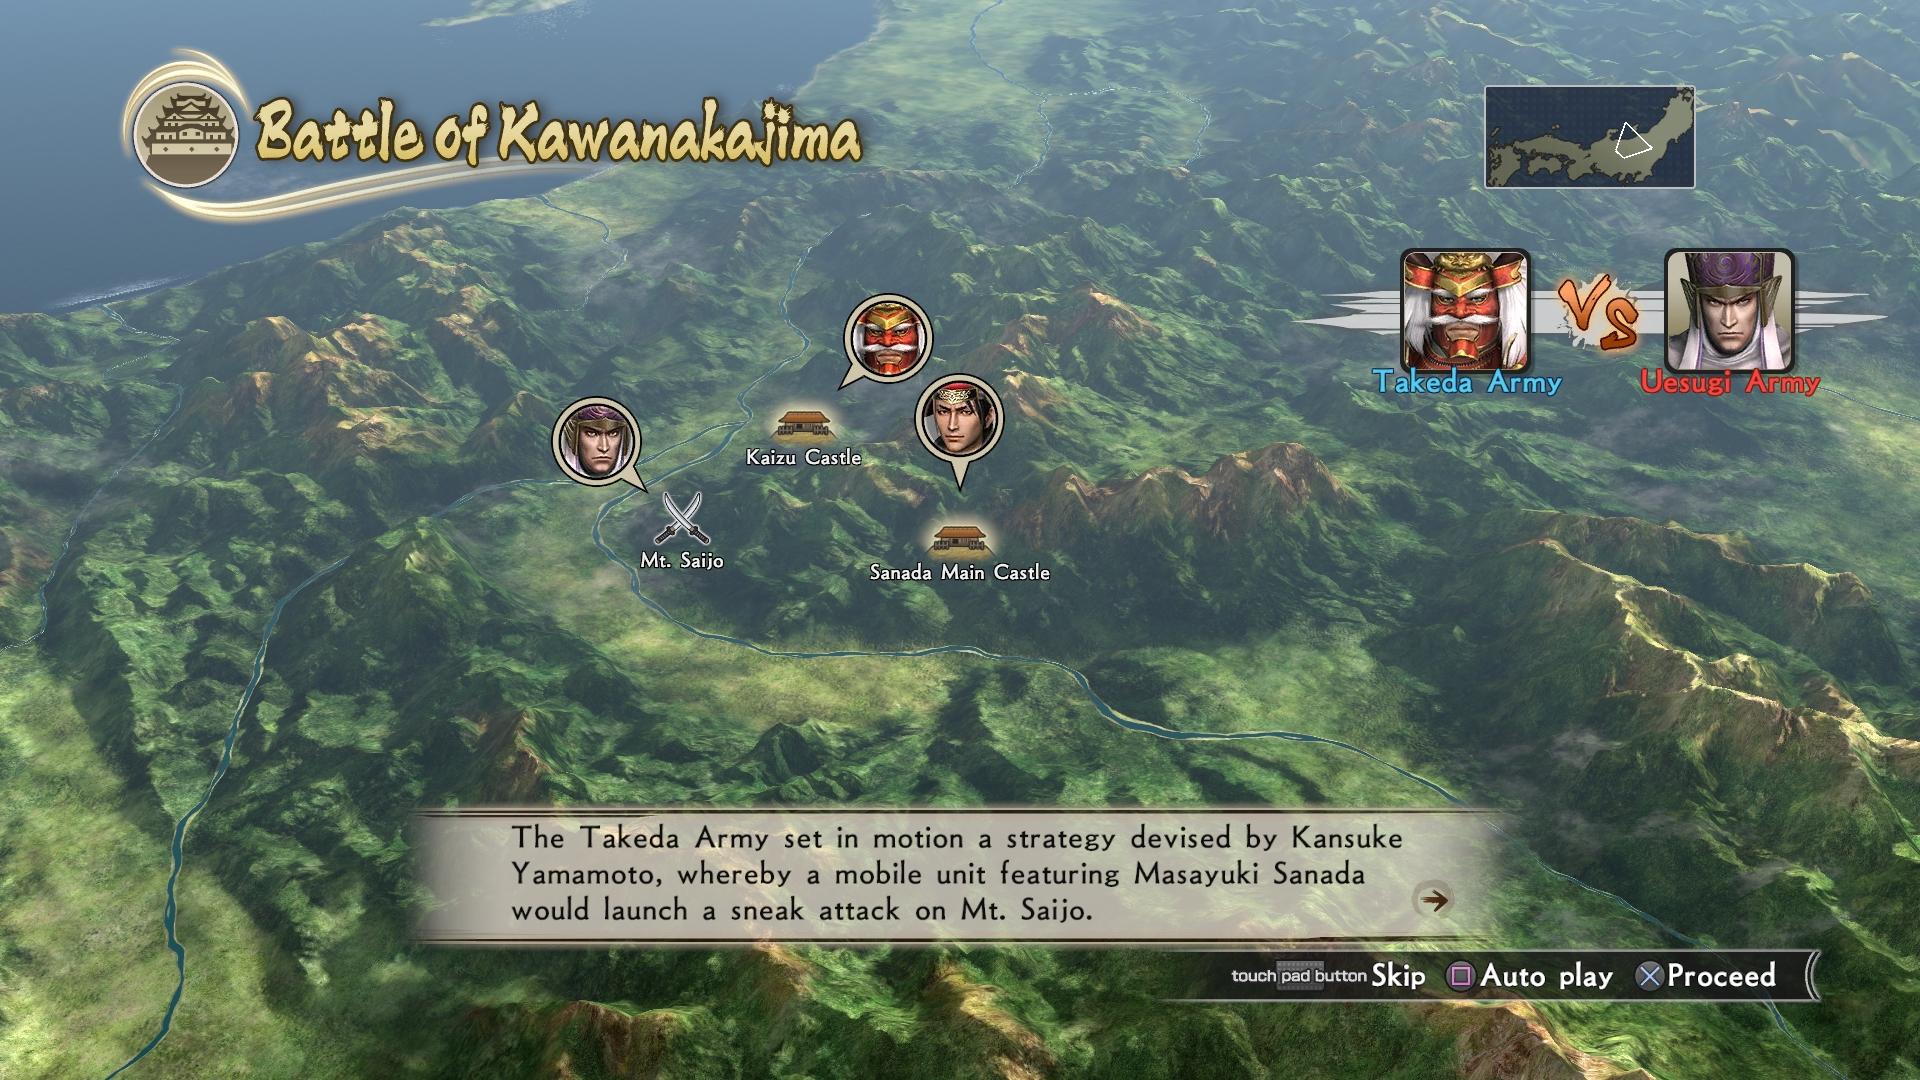 Detaily bojového systému v Samurai Warriors: Spirit of Sanada 142486